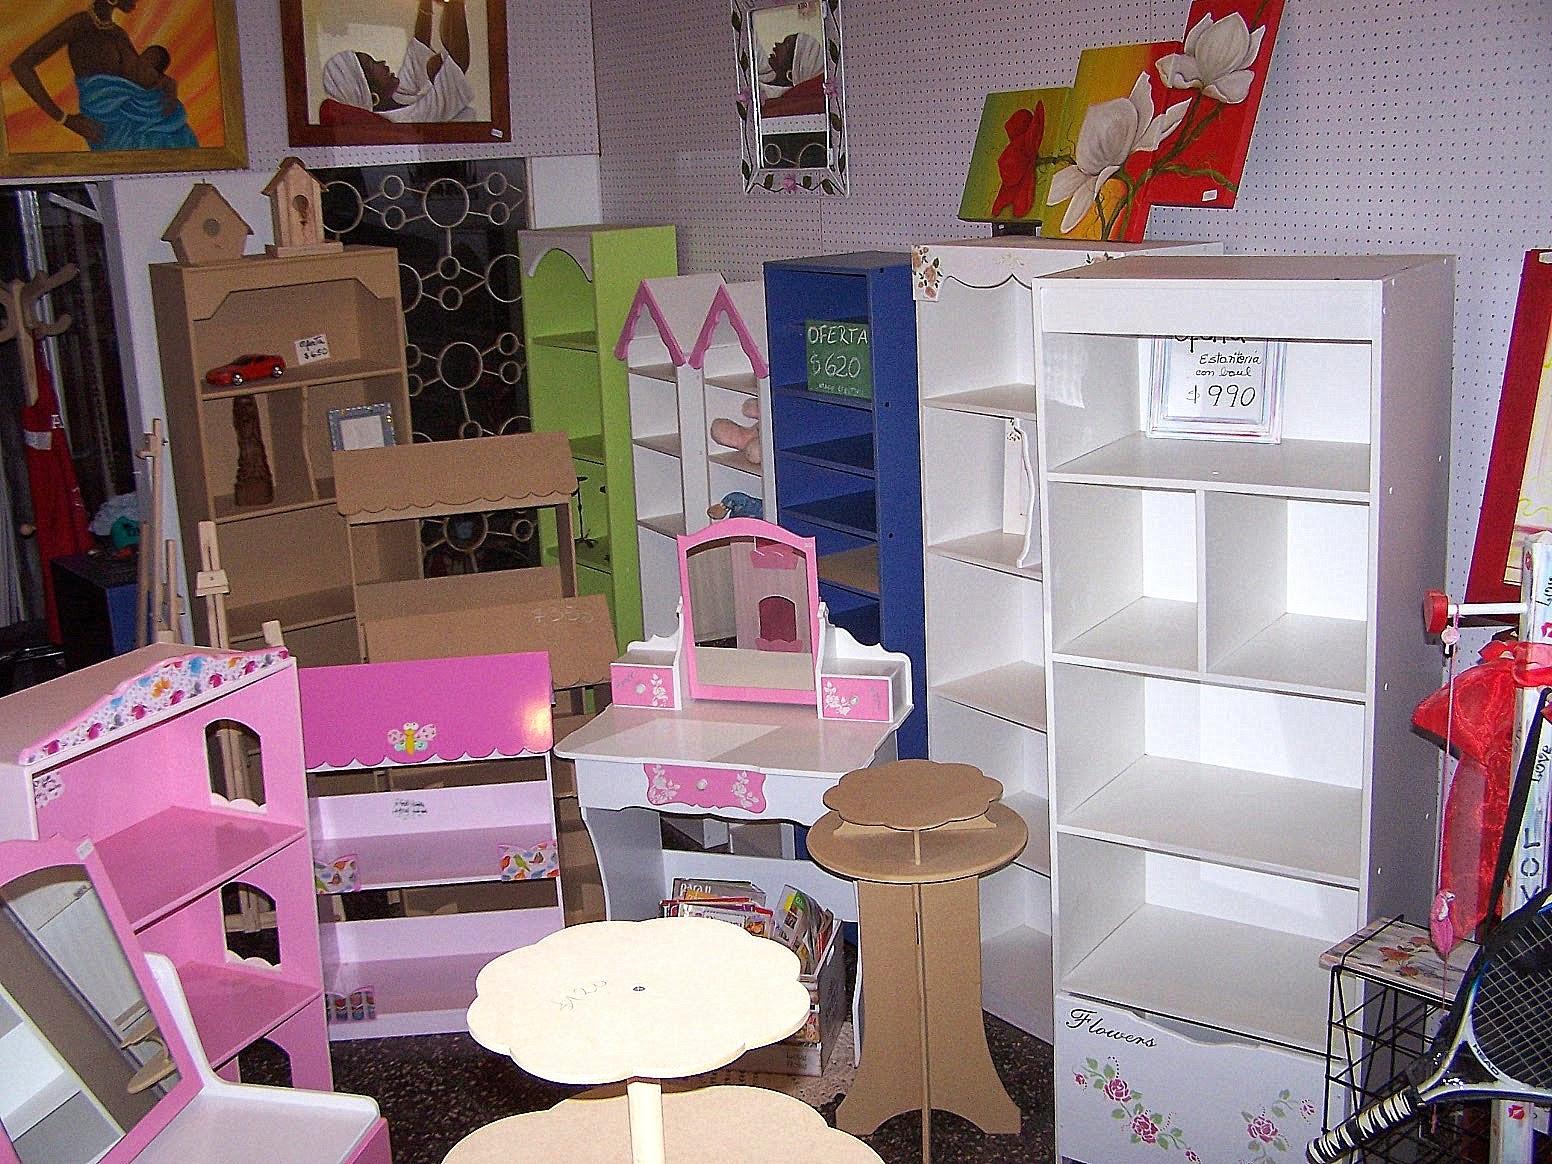 Cosas Buscadas Krause Maderas Maderas Para Pintar Decorar  # Muebles Posadas Misiones